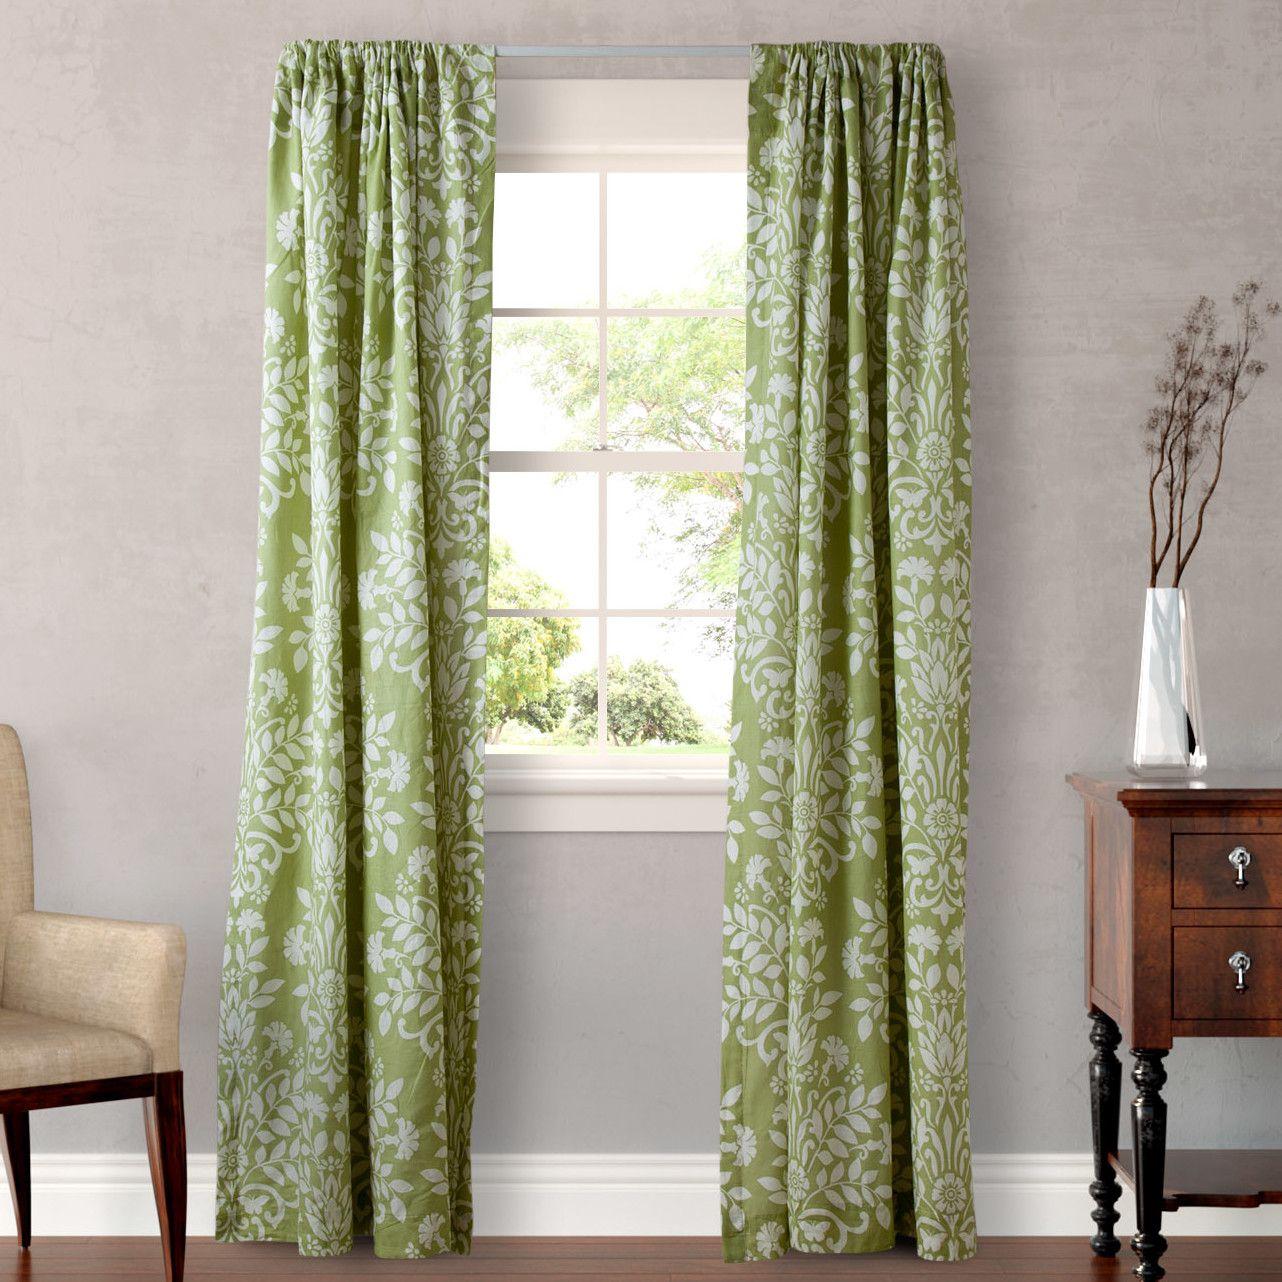 Laura Ashley Home Rowland Curtain Panel Sage Curtains Panel